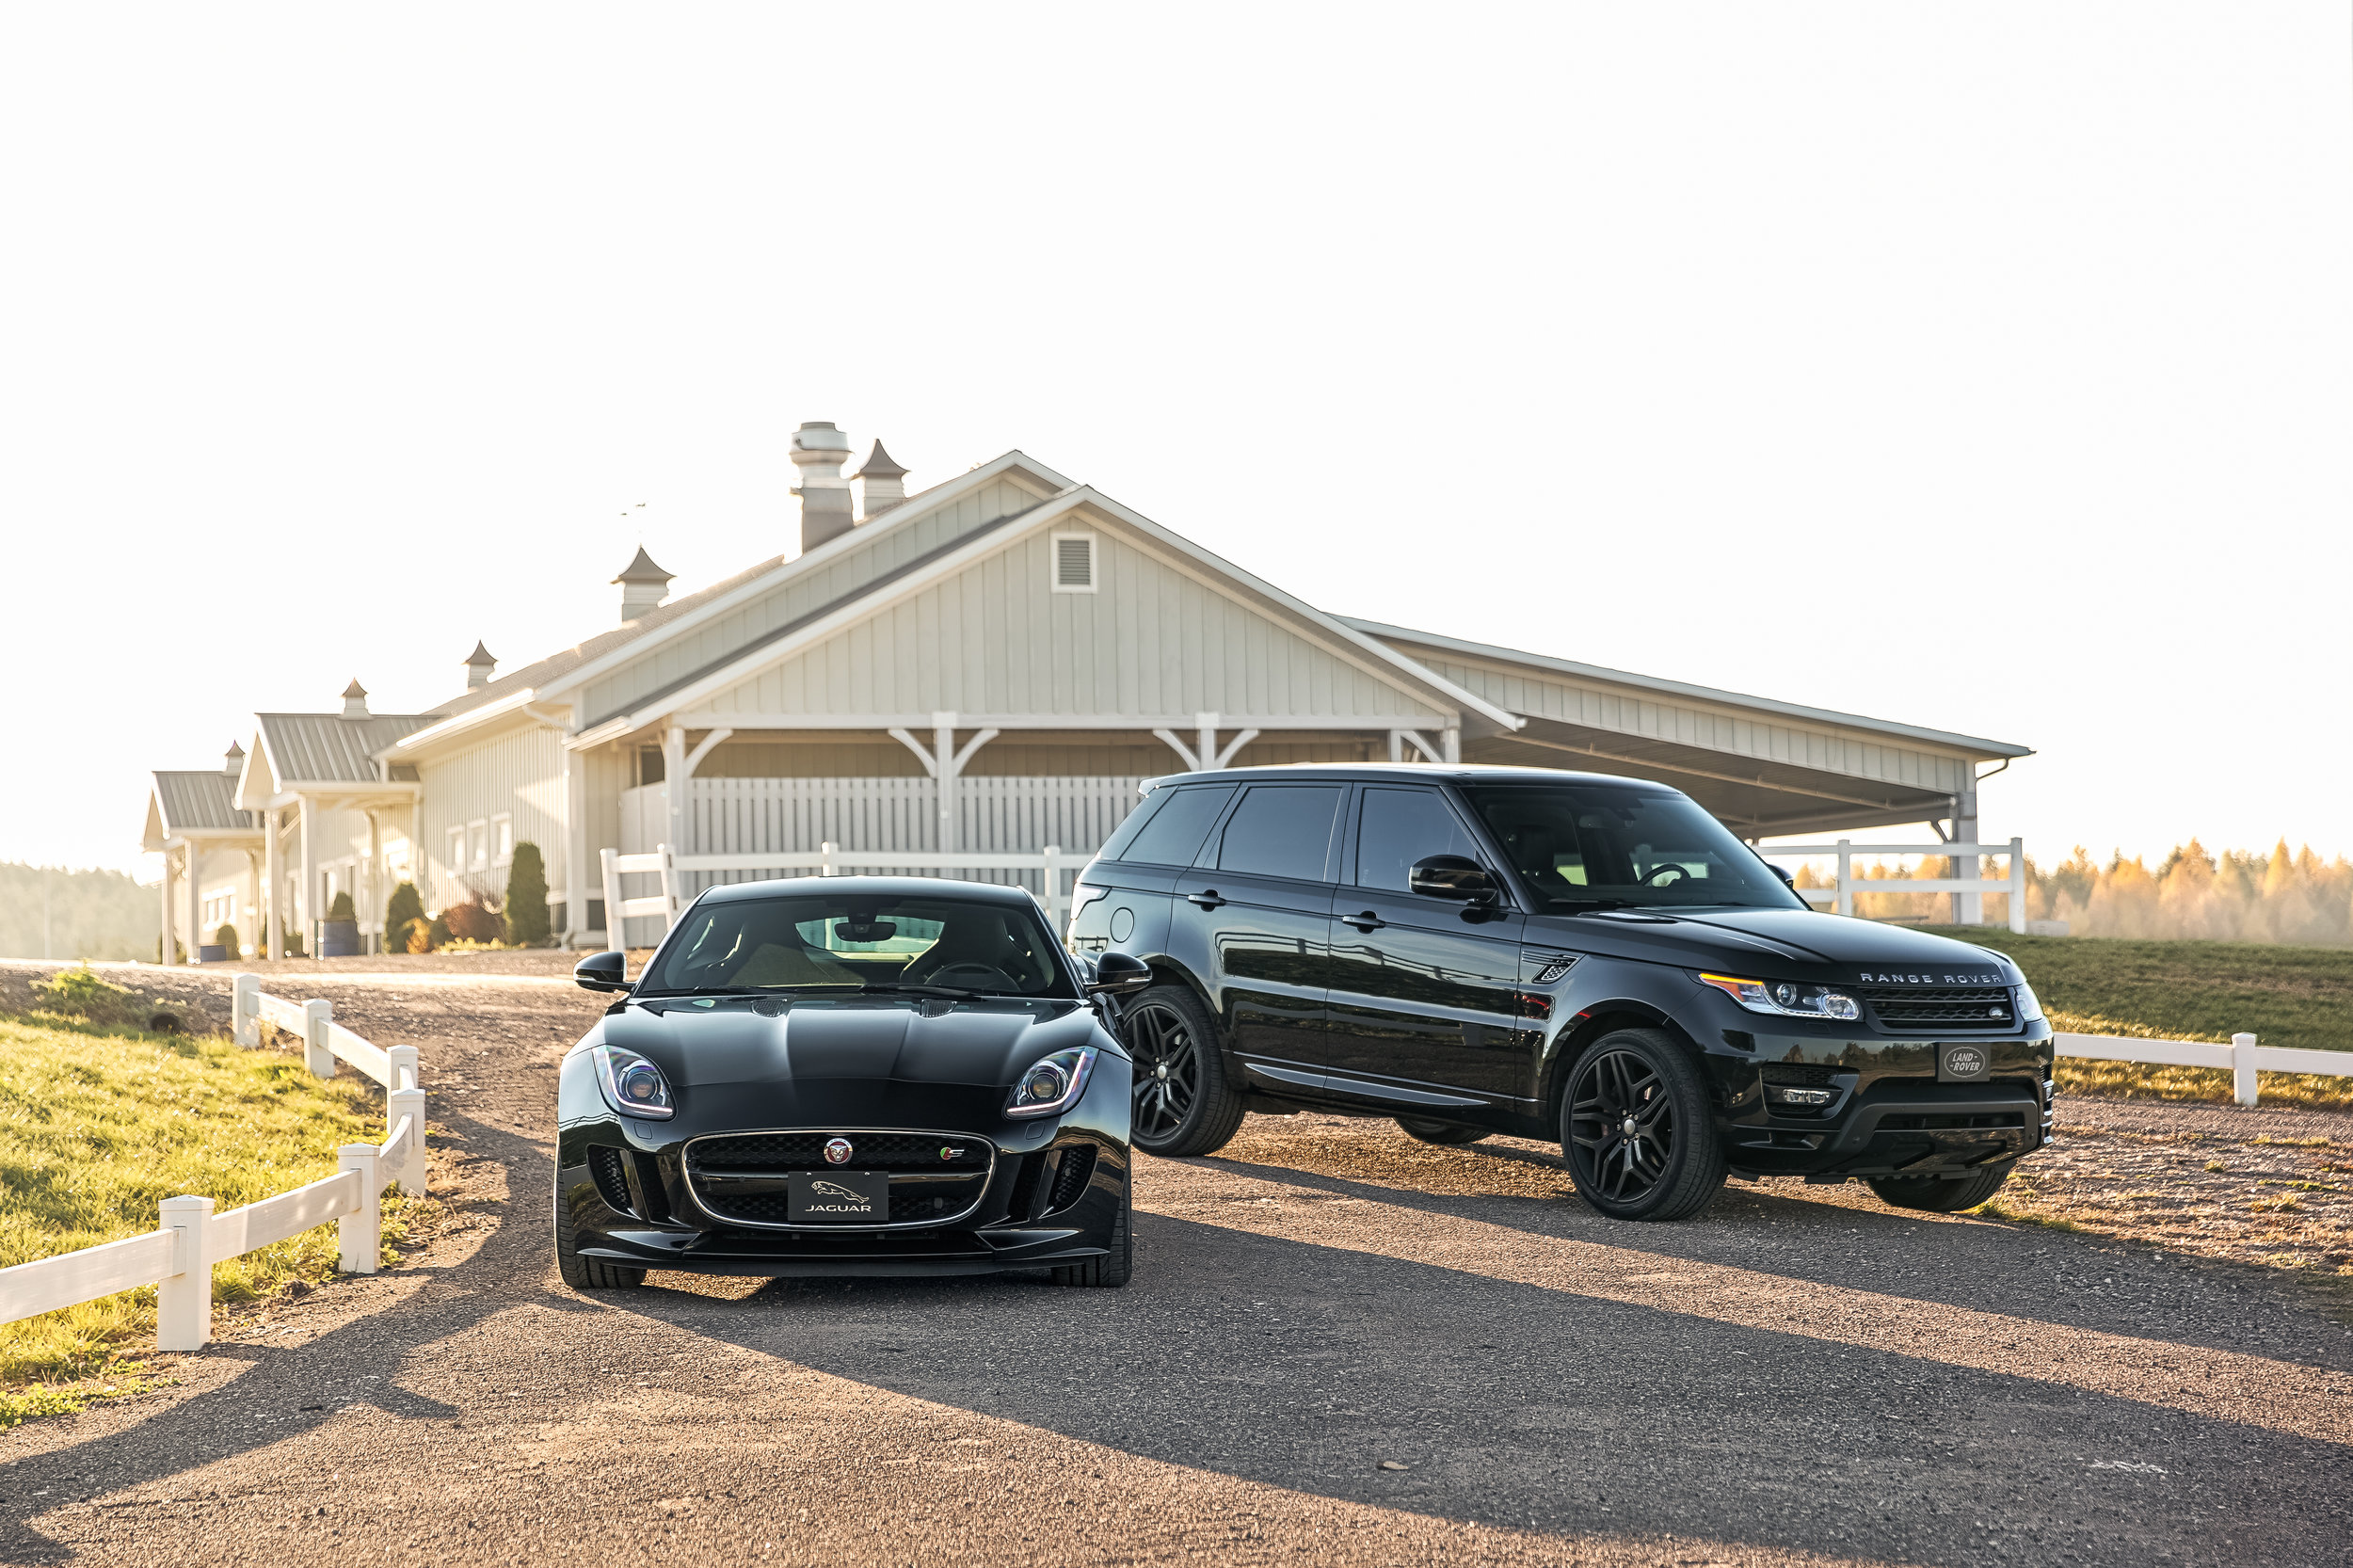 Policaro Land Rover Jaguar - Digital Viking--6.jpg